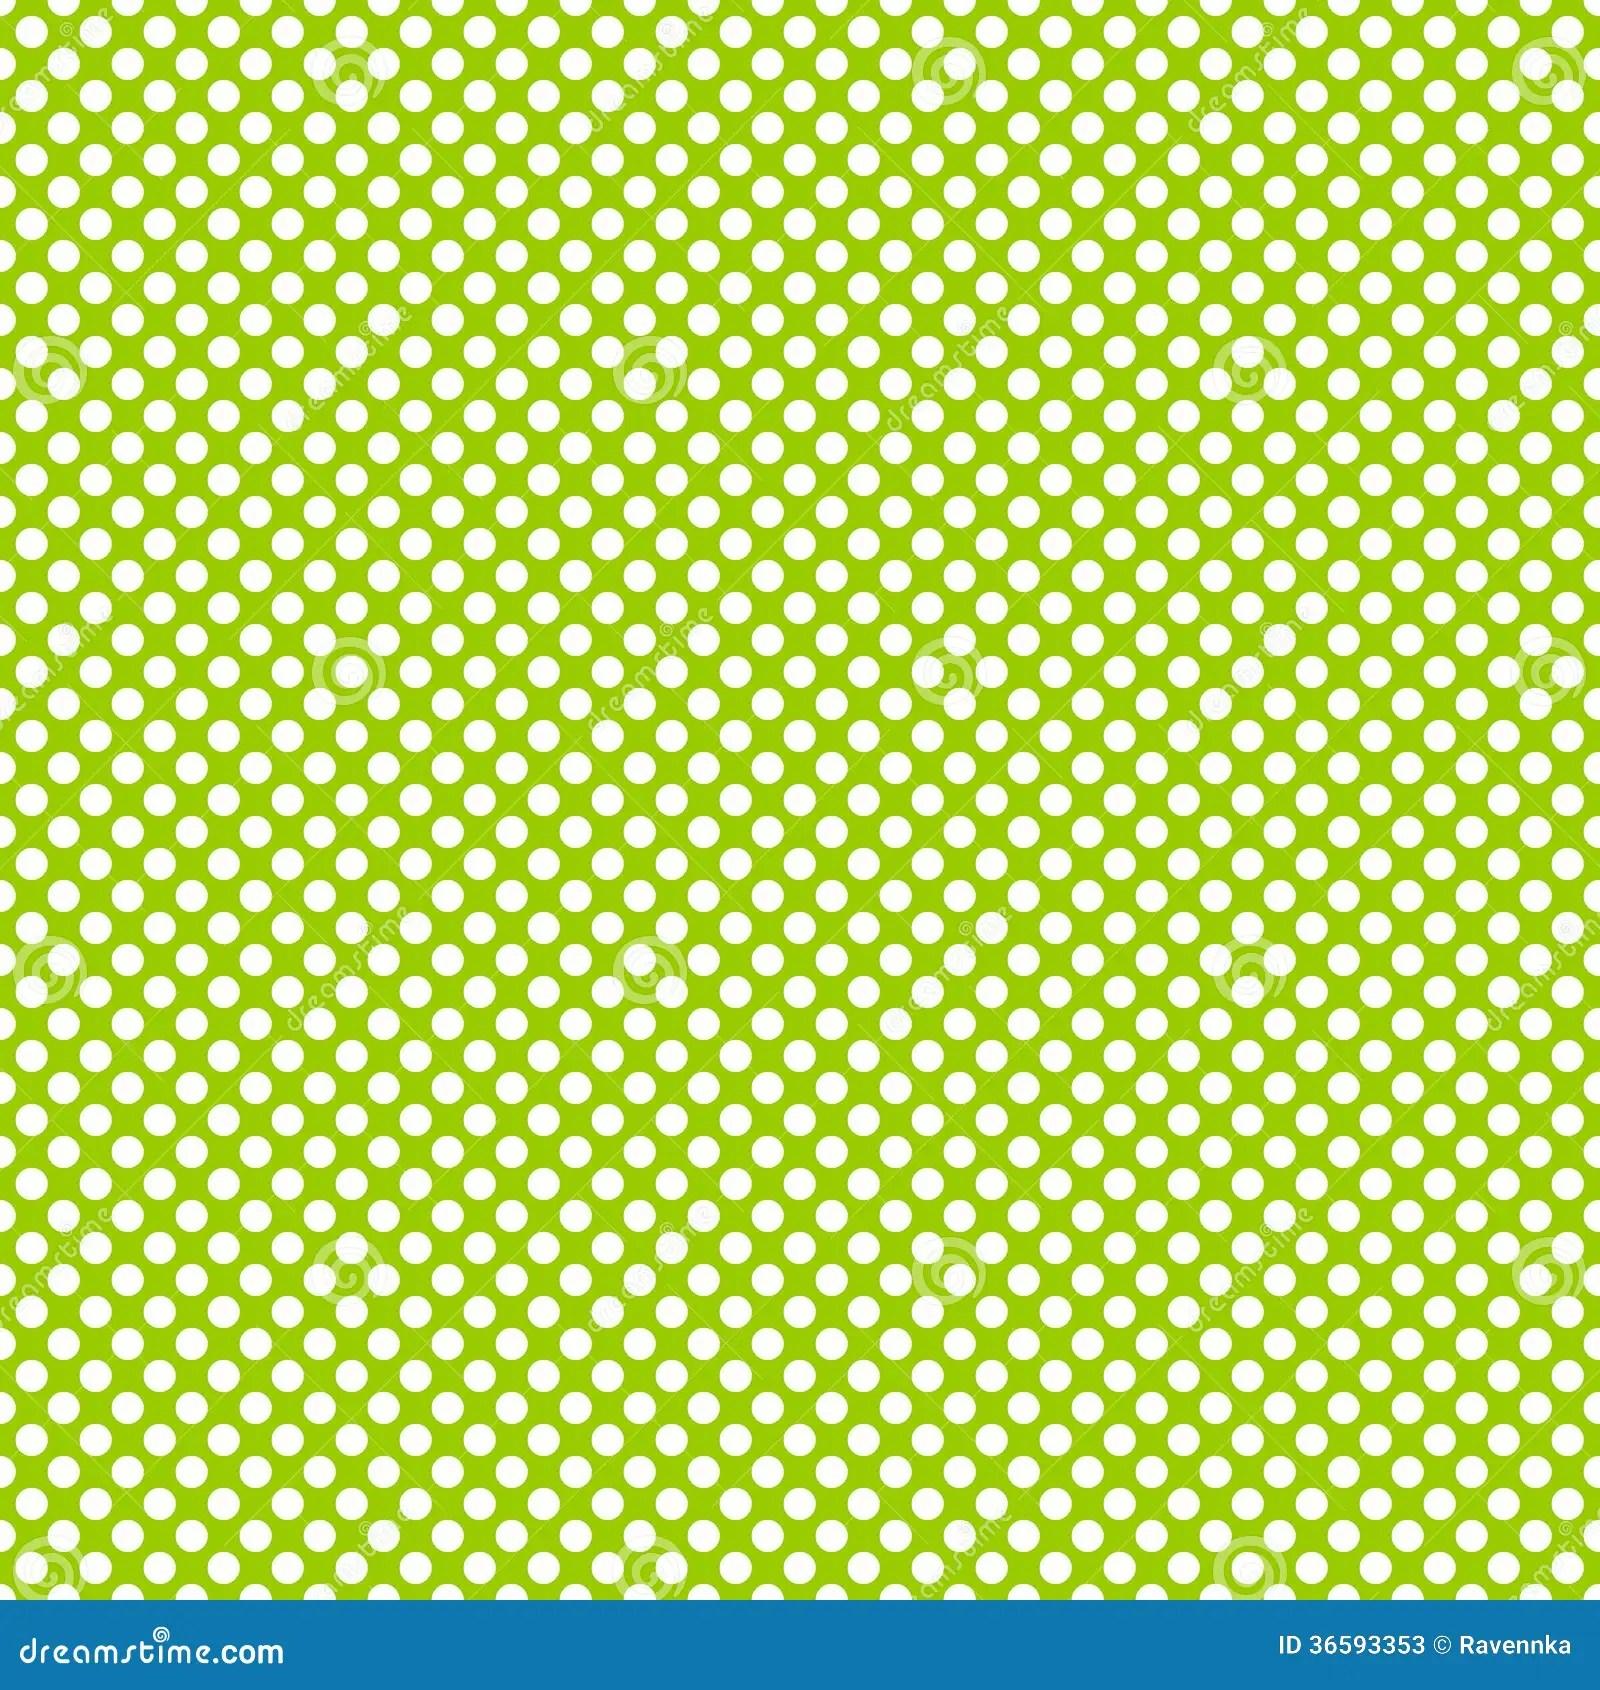 Baby Girl Nursery Wallpaper Borders Polka Dot Pattern Stock Photos Image 36593353